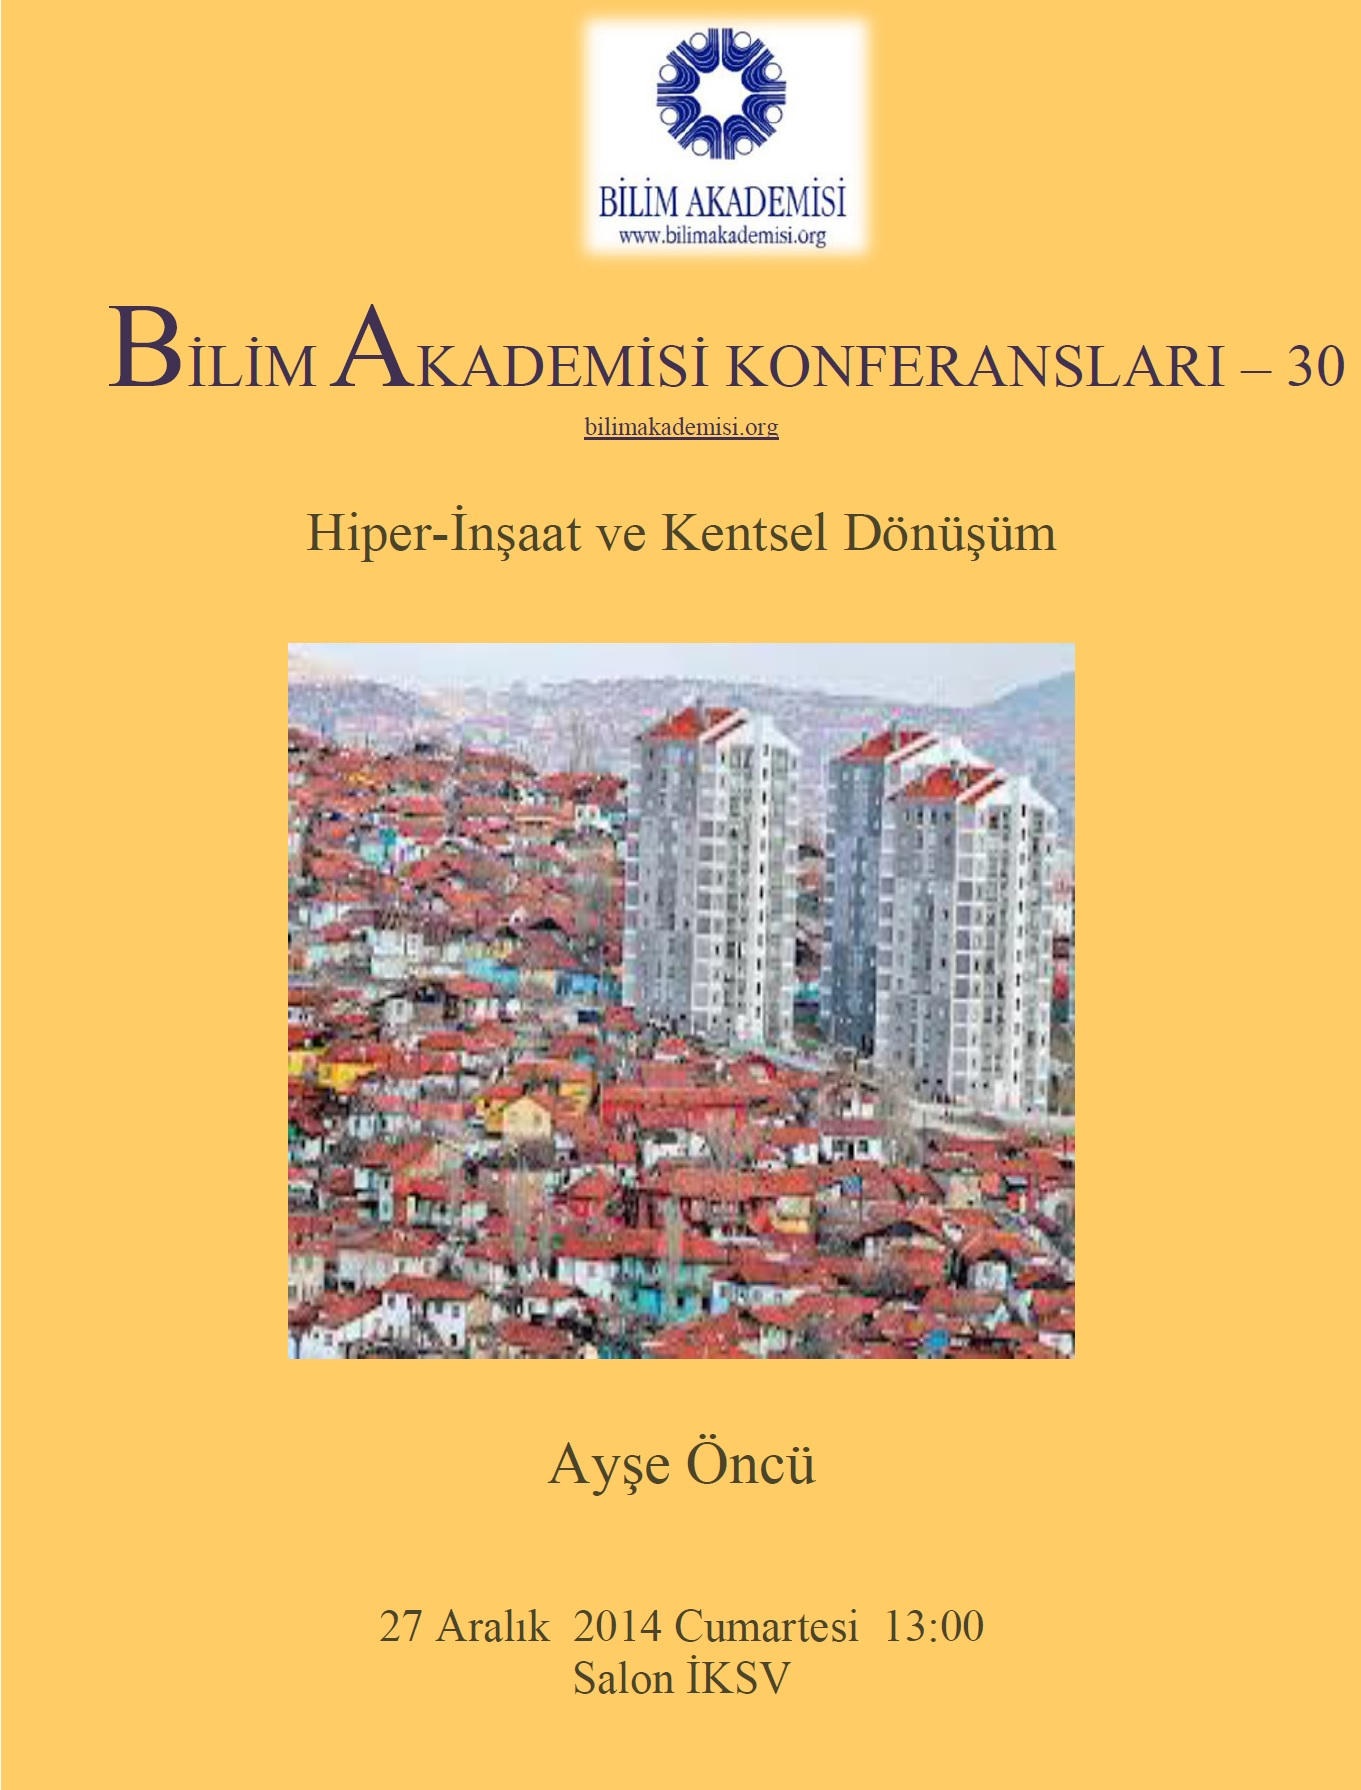 Hyper-Construction and Urban Transformation – Speaker: Ayşe Öncü